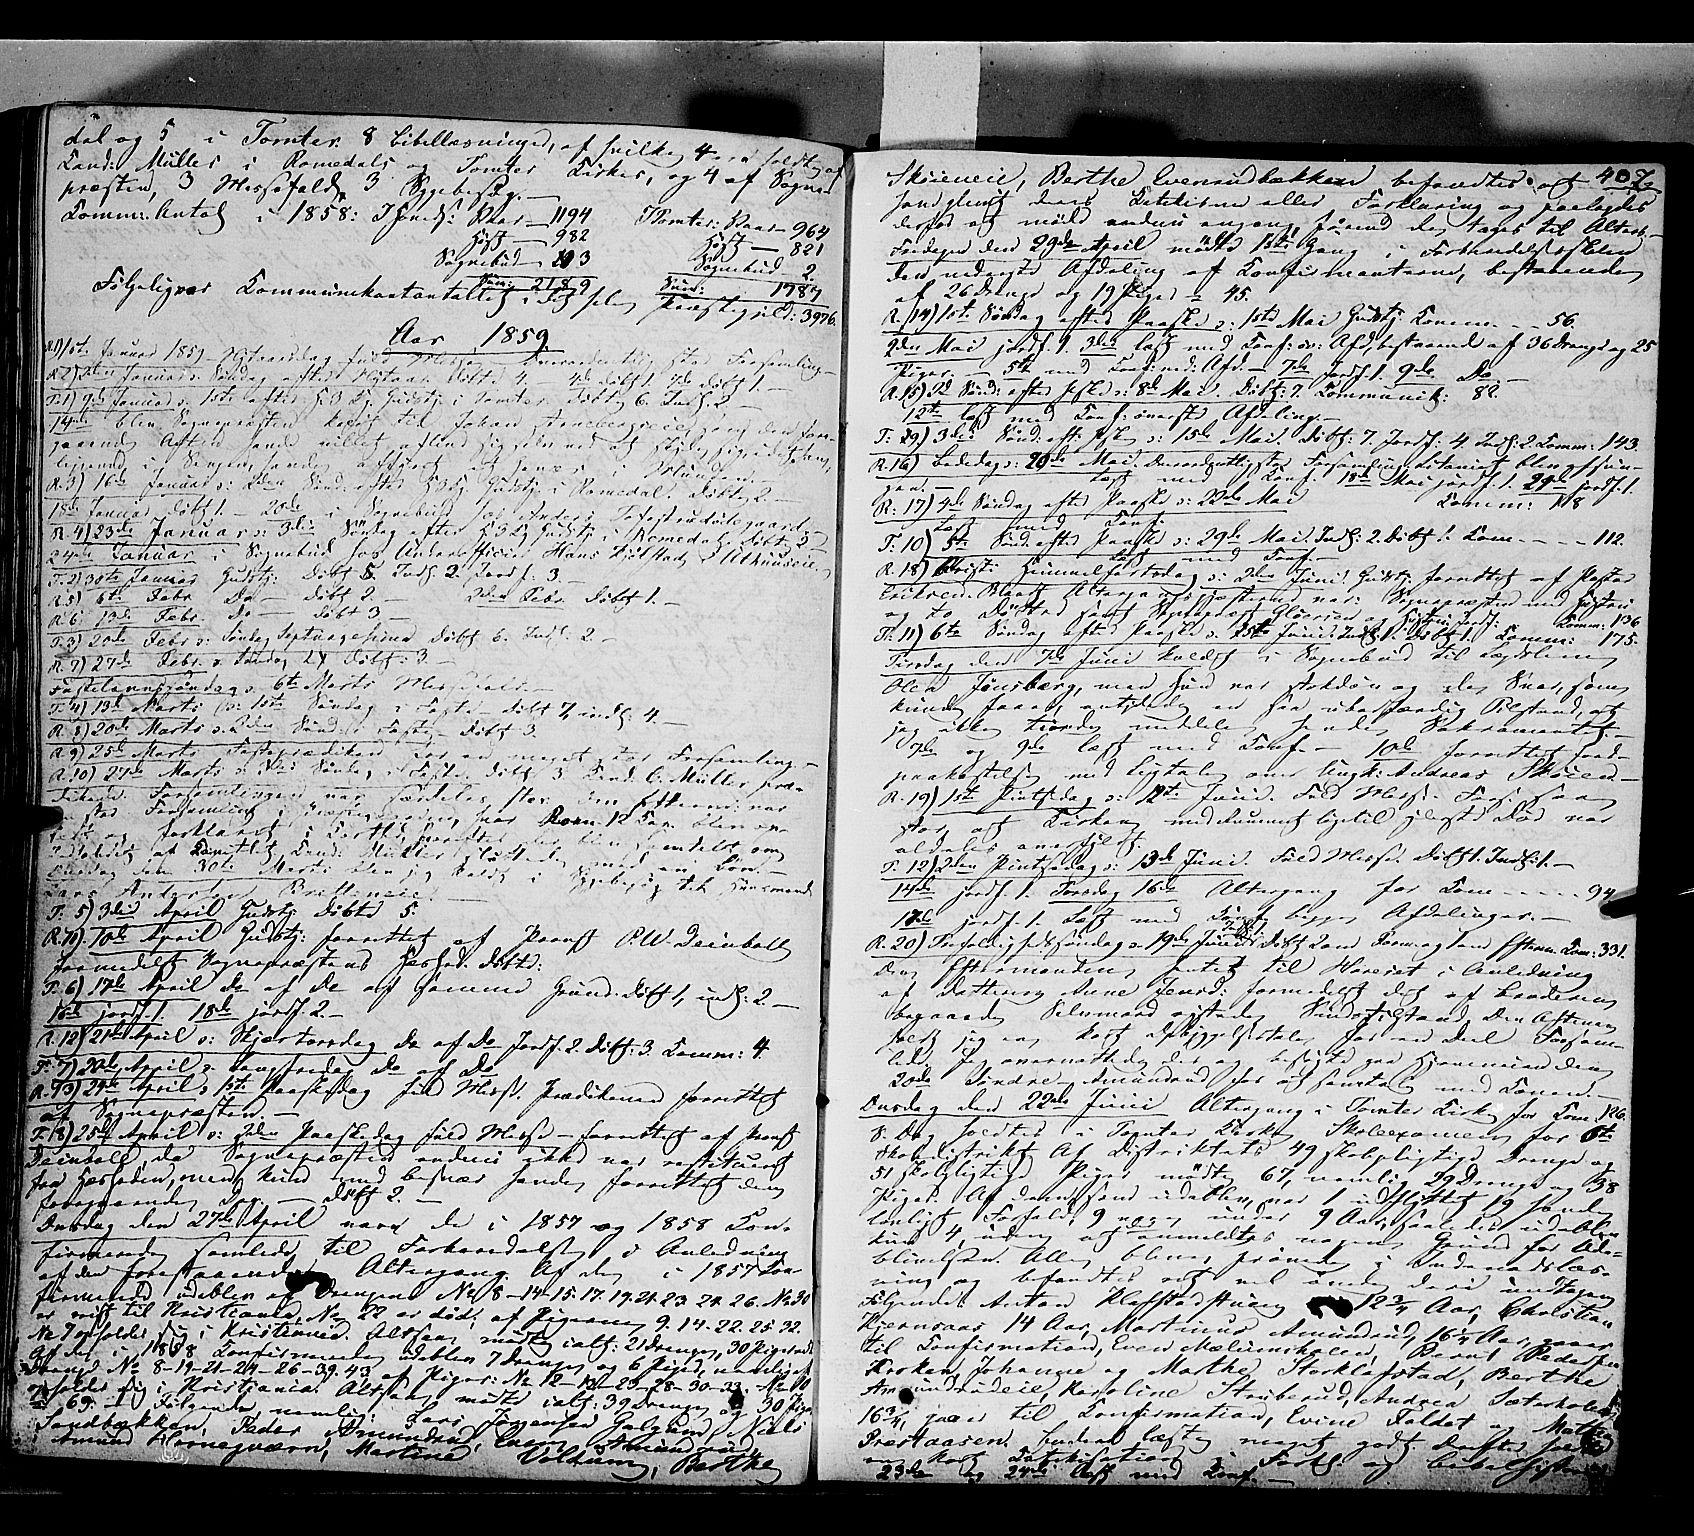 SAH, Romedal prestekontor, K/L0004: Ministerialbok nr. 4, 1847-1861, s. 407